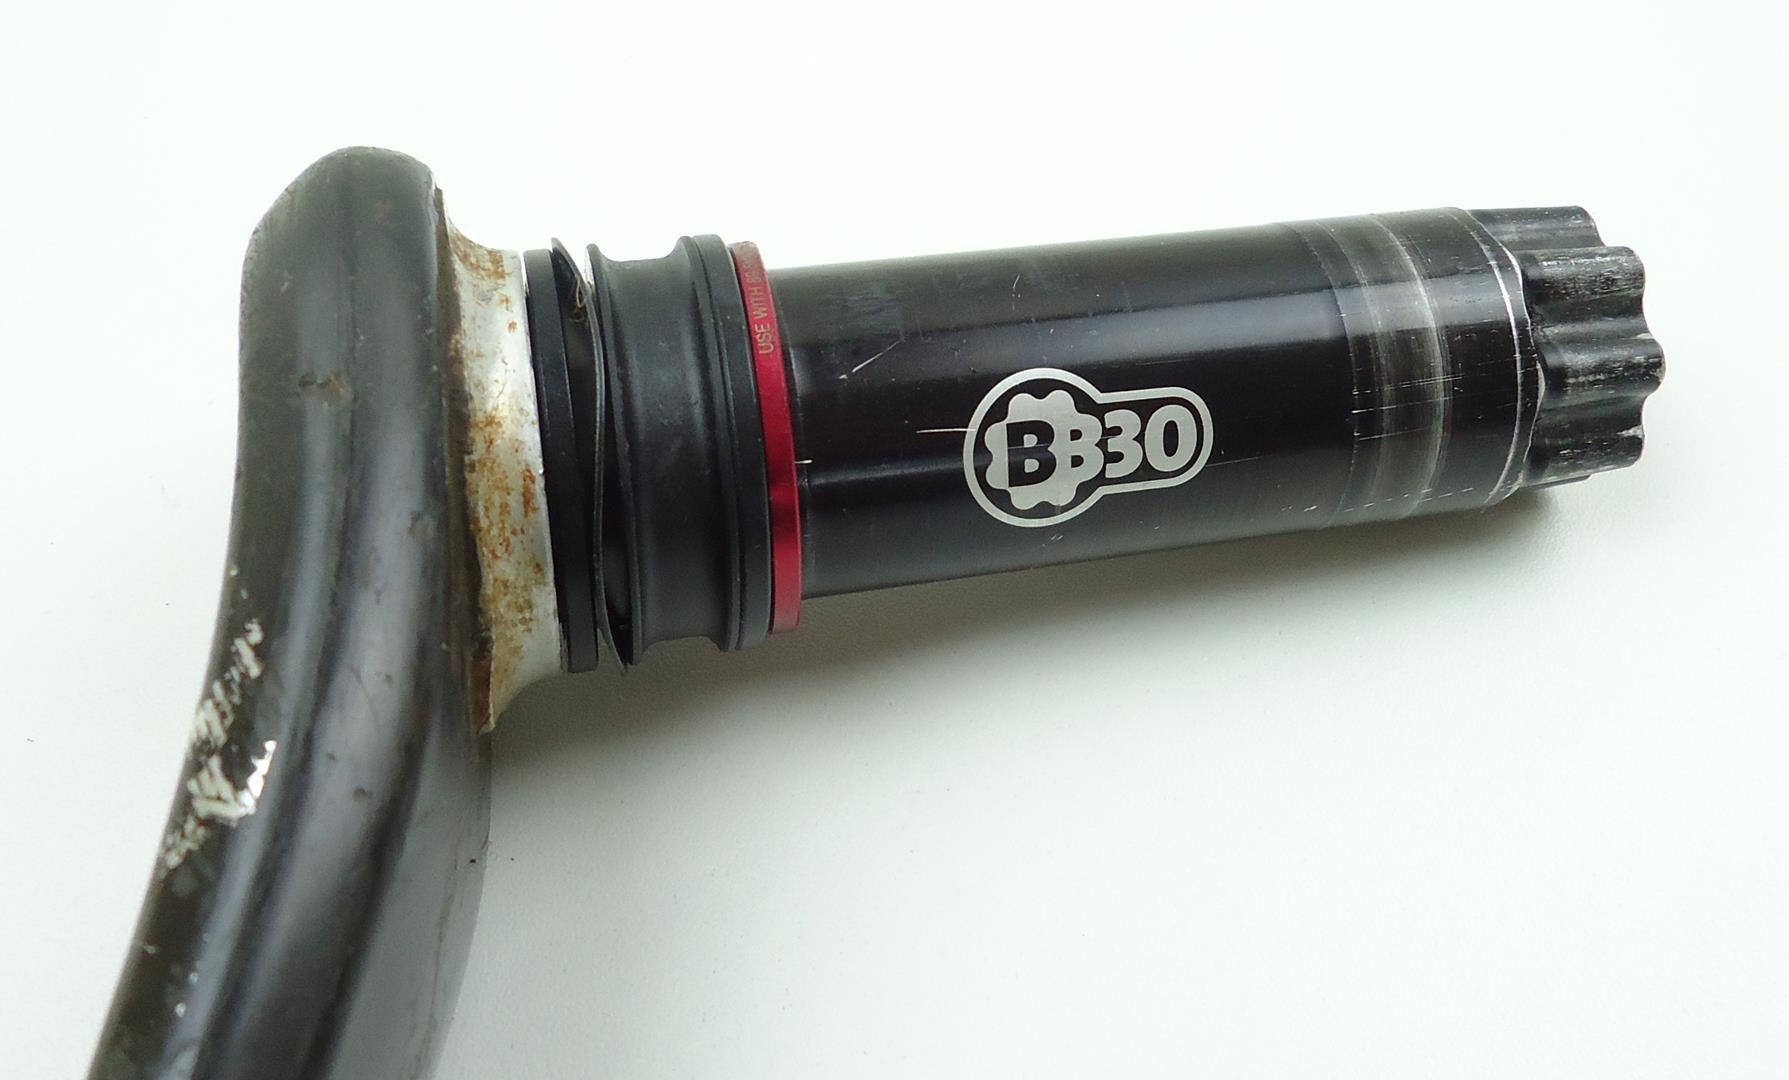 Pedivela Sram Mtb S2200 Carbono BB30 1x12 Coroa 32 Dentes Eagle X0 175mm - USADO